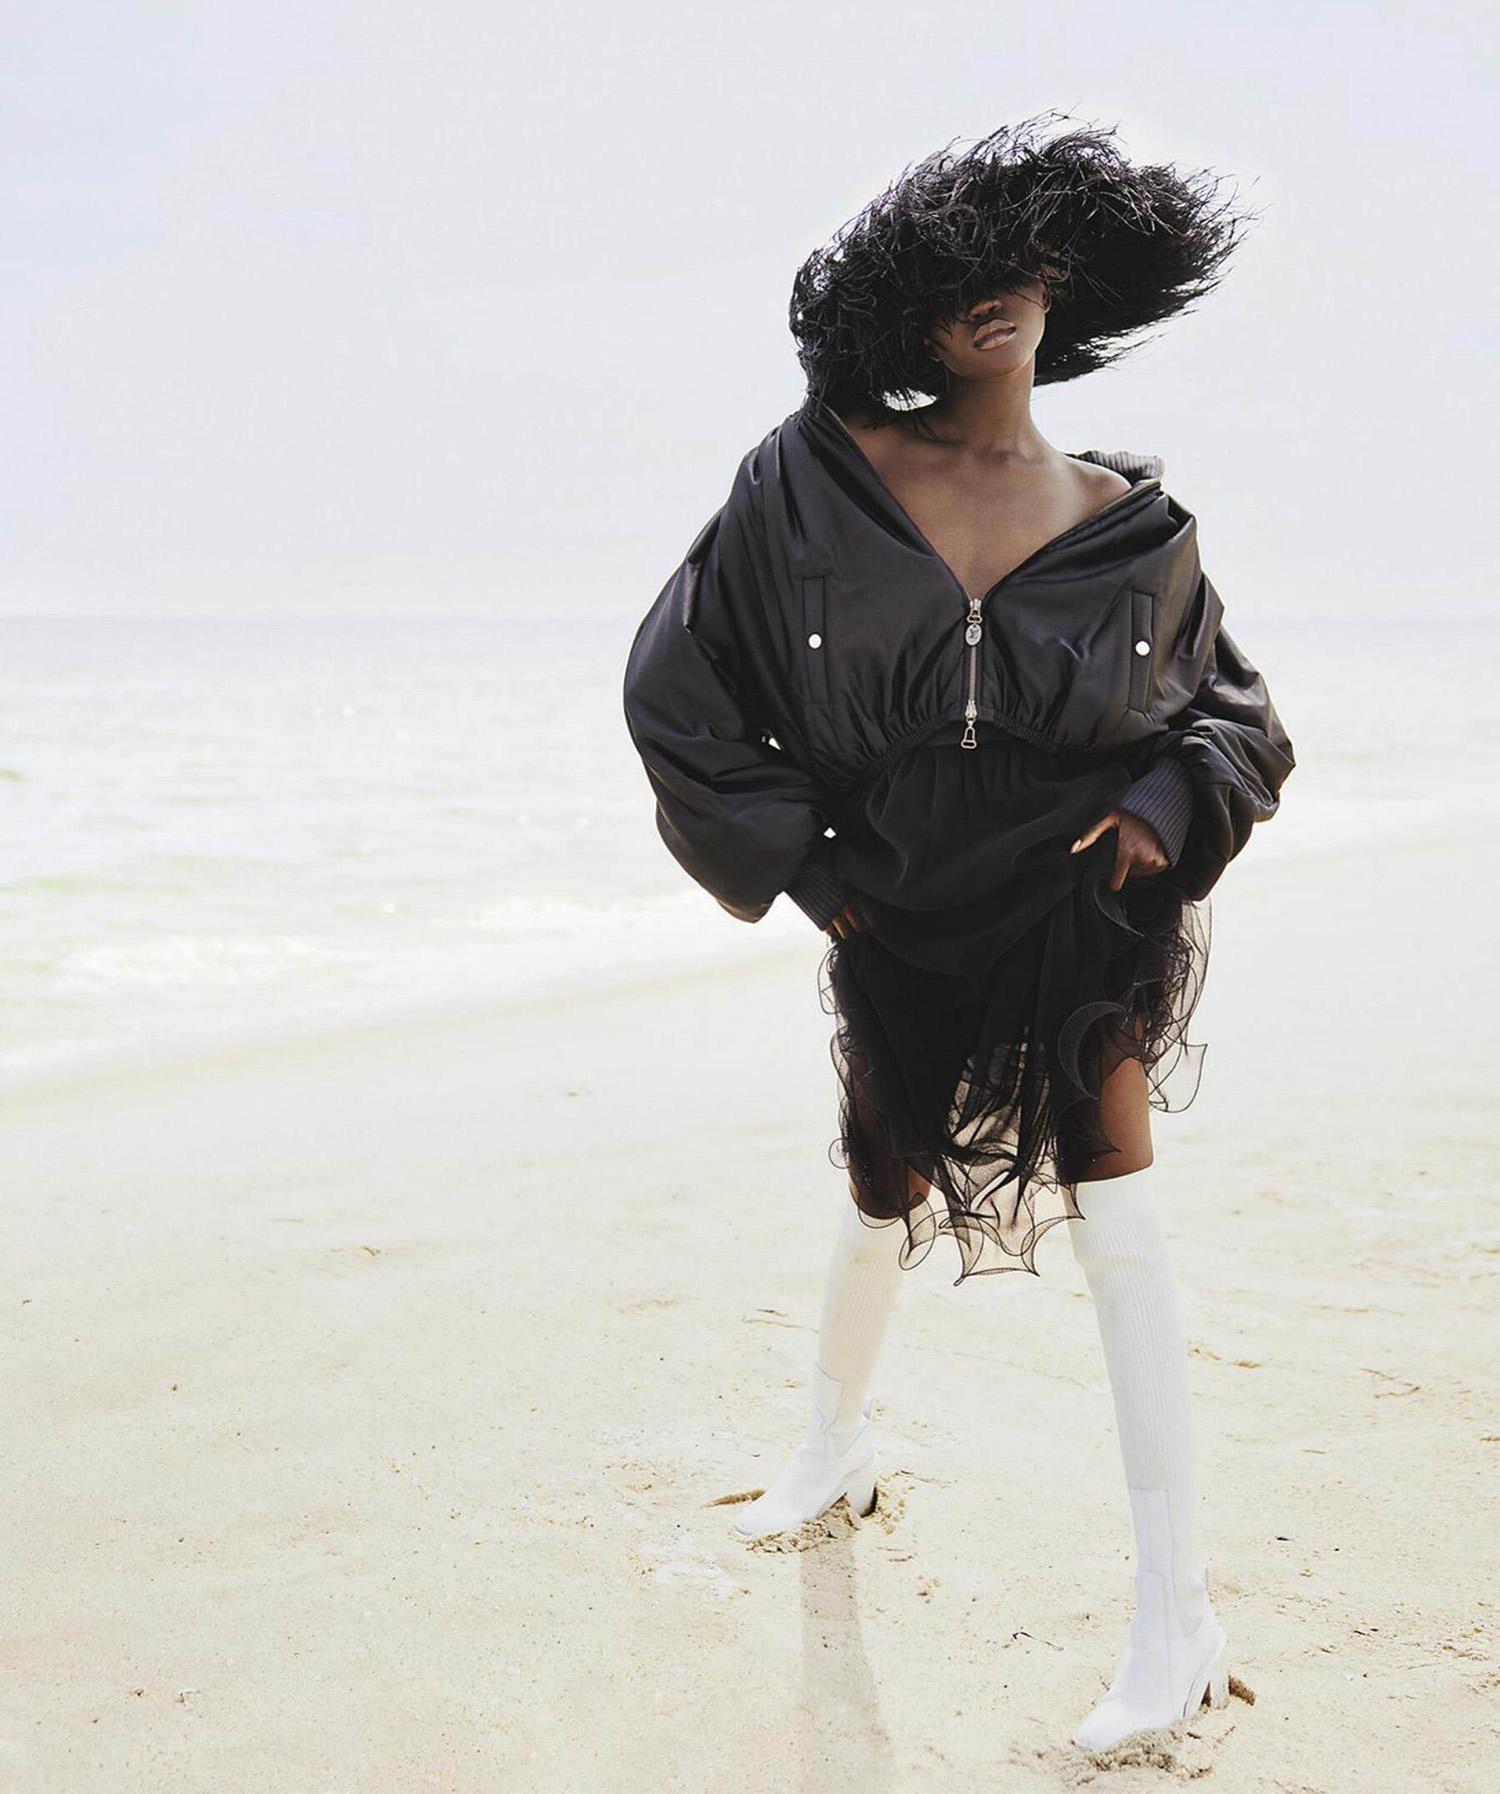 Achenrin Madit by Drew Jarrett for Vogue Australia October 2021